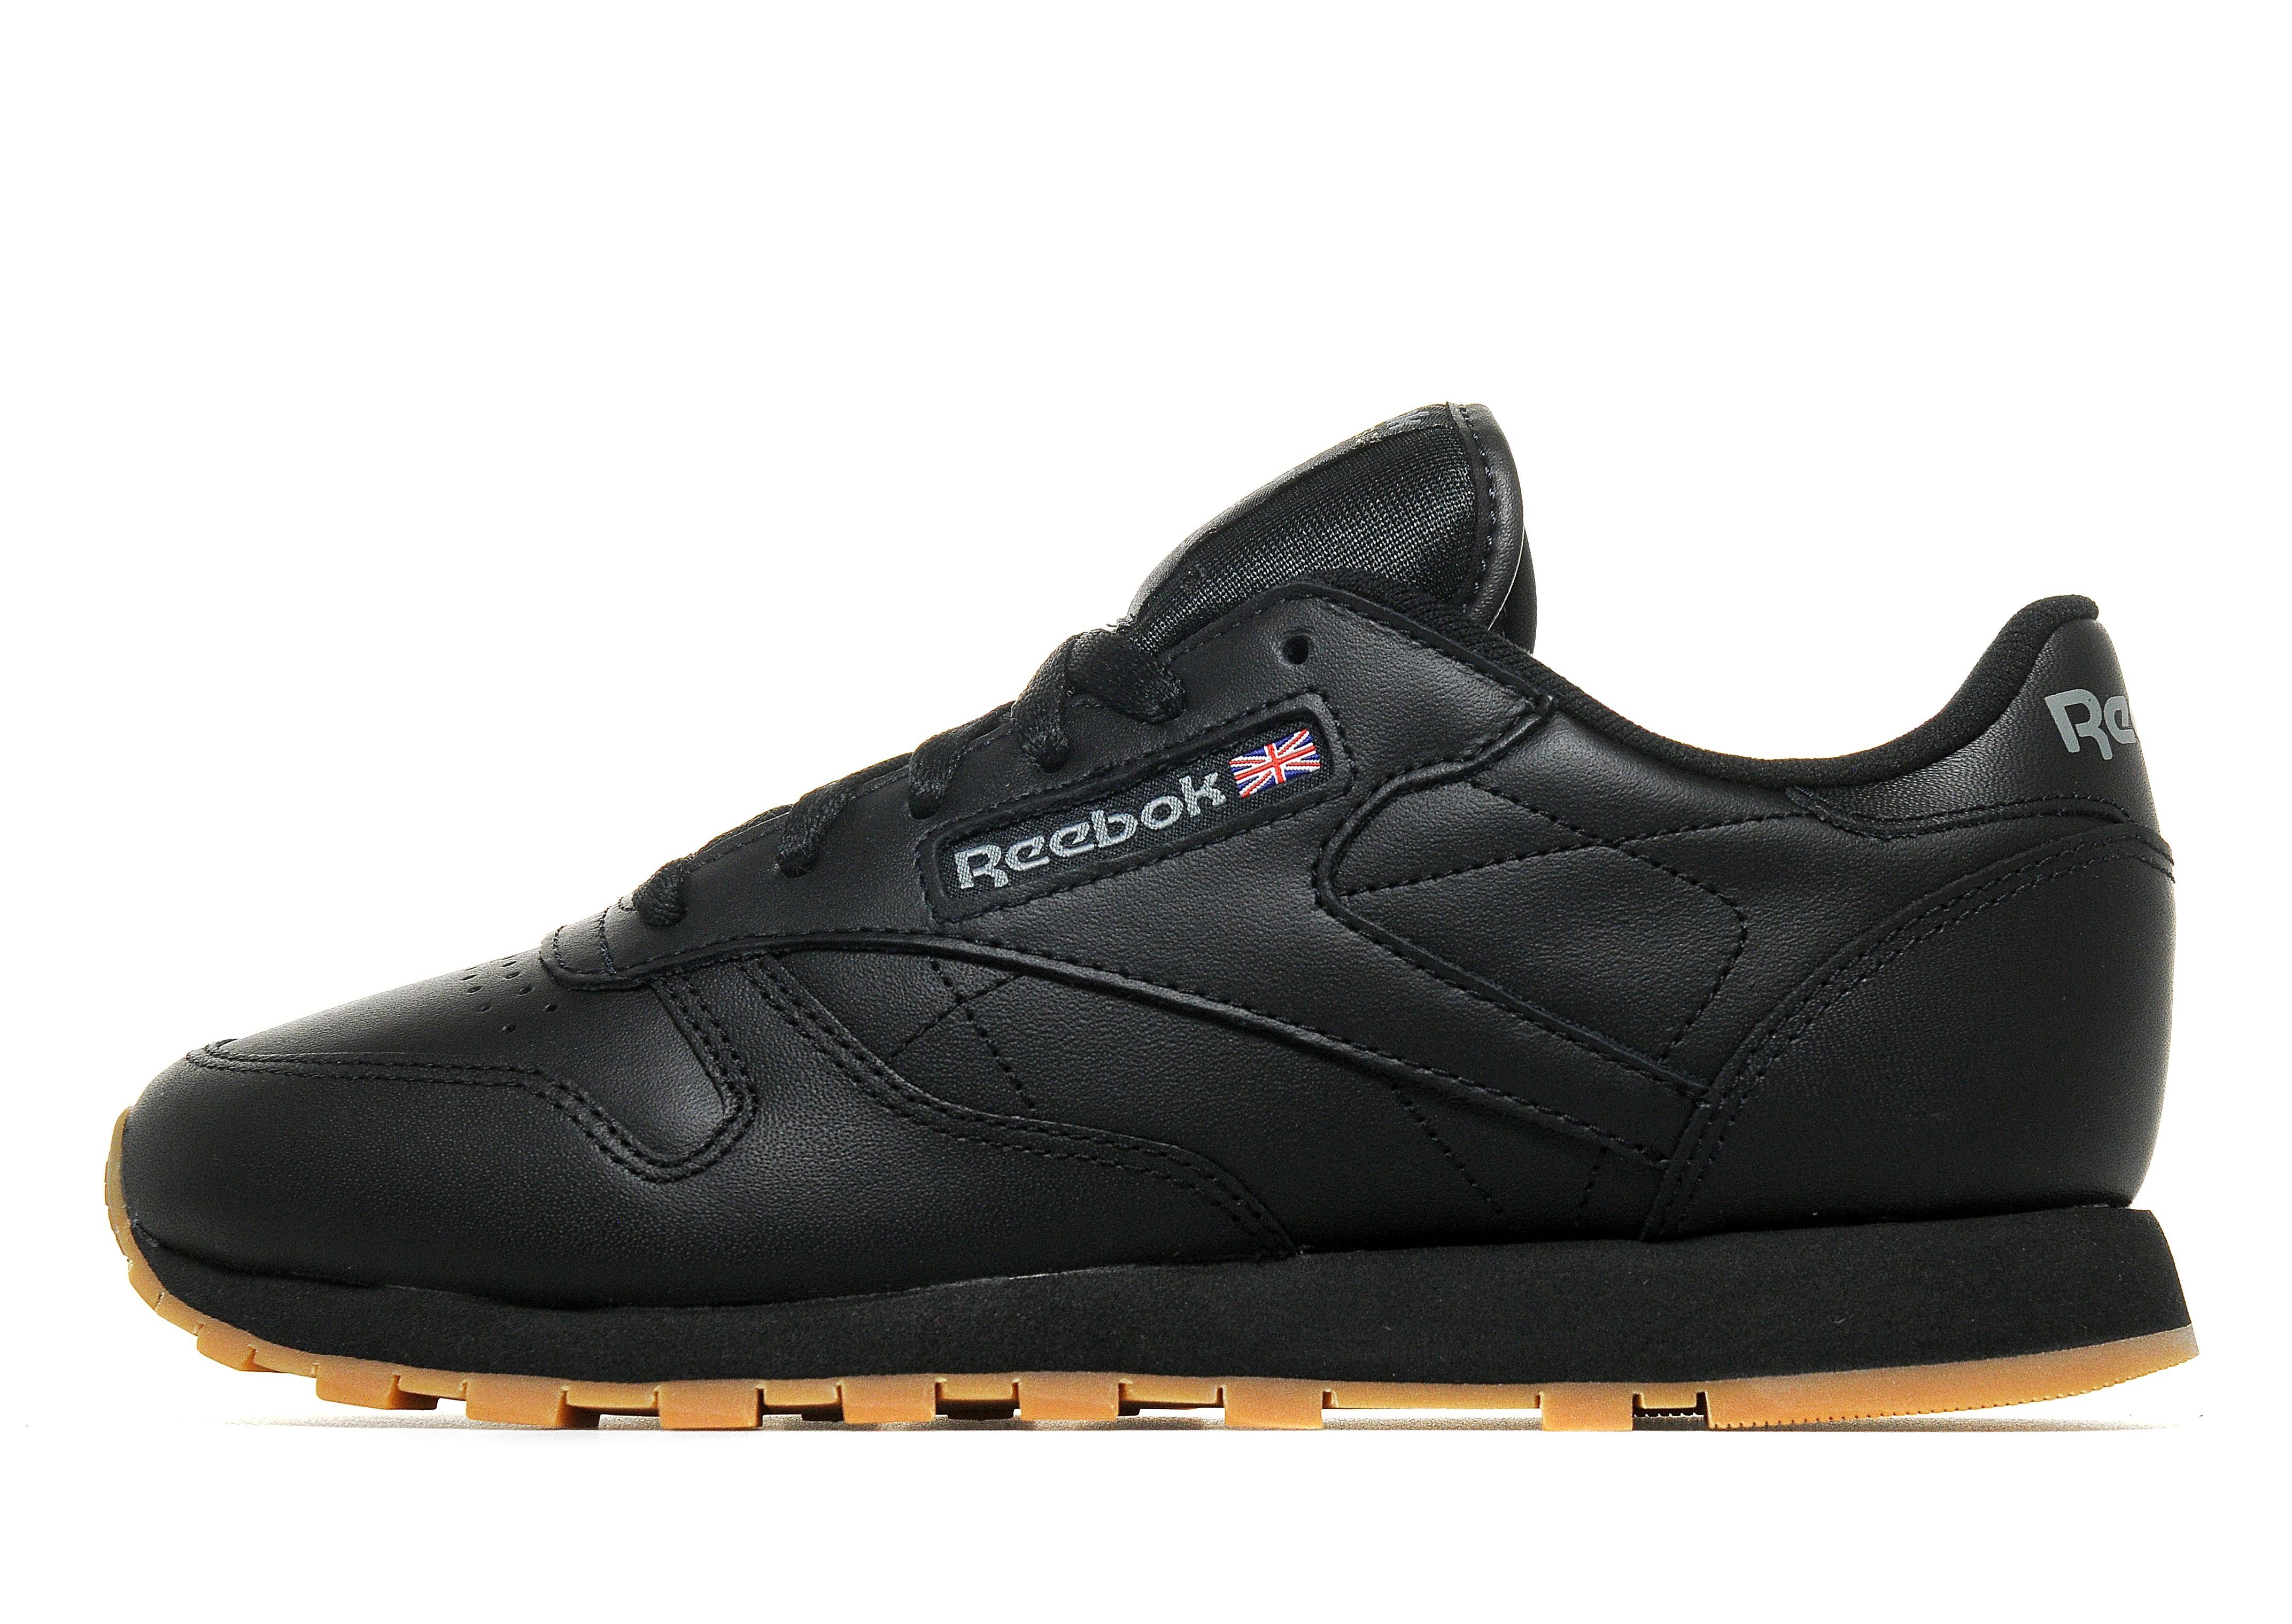 Reebok Classic Leather Women's